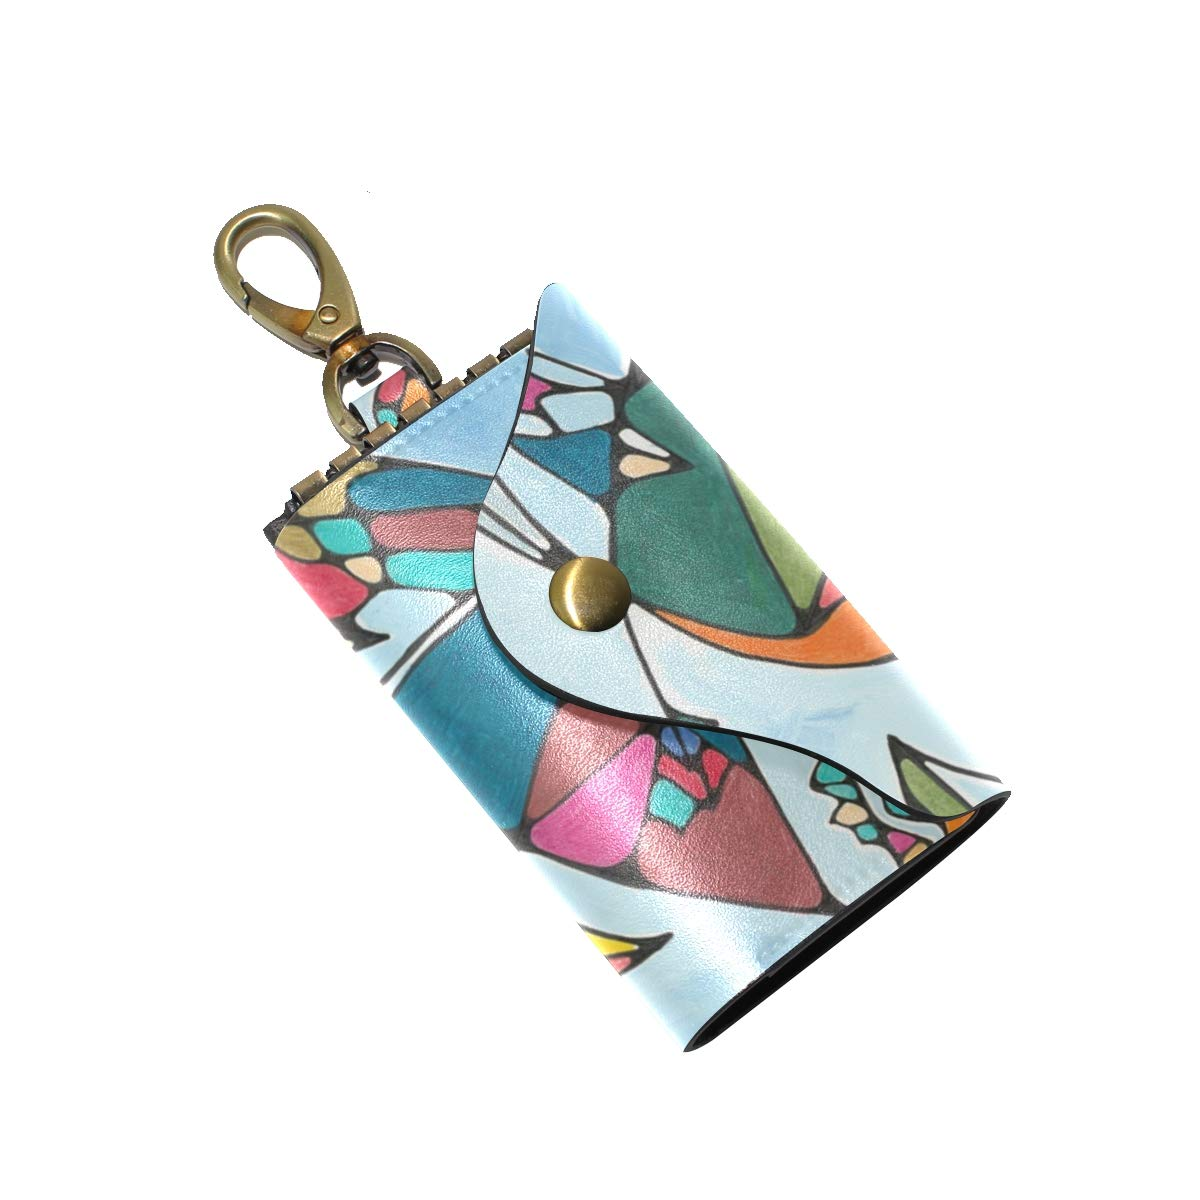 KEAKIA Watermark Kite Leather Key Case Wallets Tri-fold Key Holder Keychains with 6 Hooks 2 Slot Snap Closure for Men Women